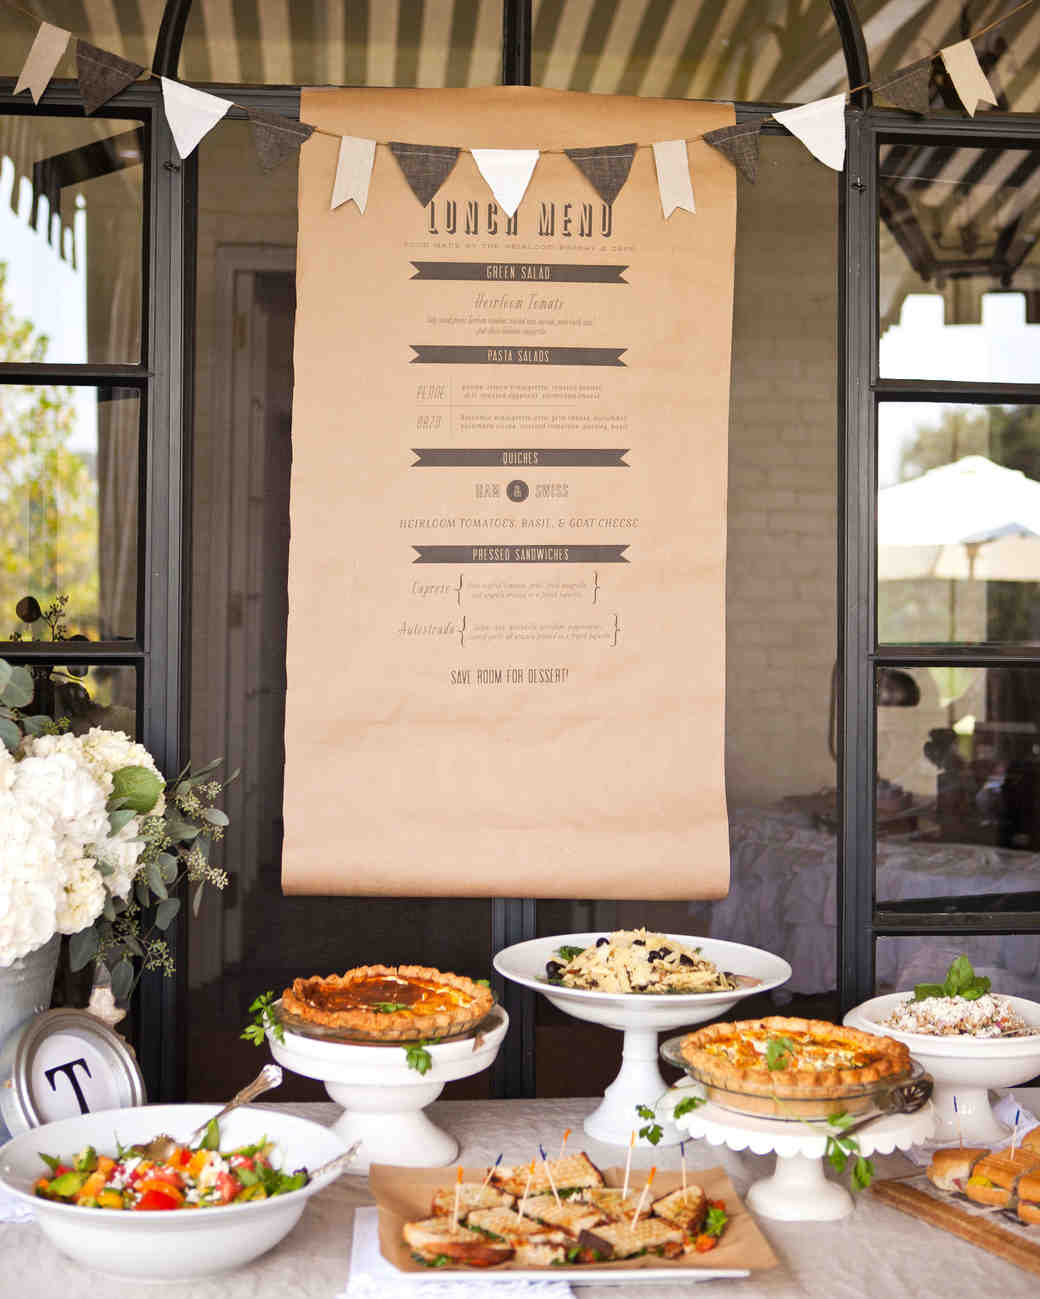 Fall Wedding Buffet Menu Ideas: 33 Pretty And Unexpected Wedding Menu Ideas